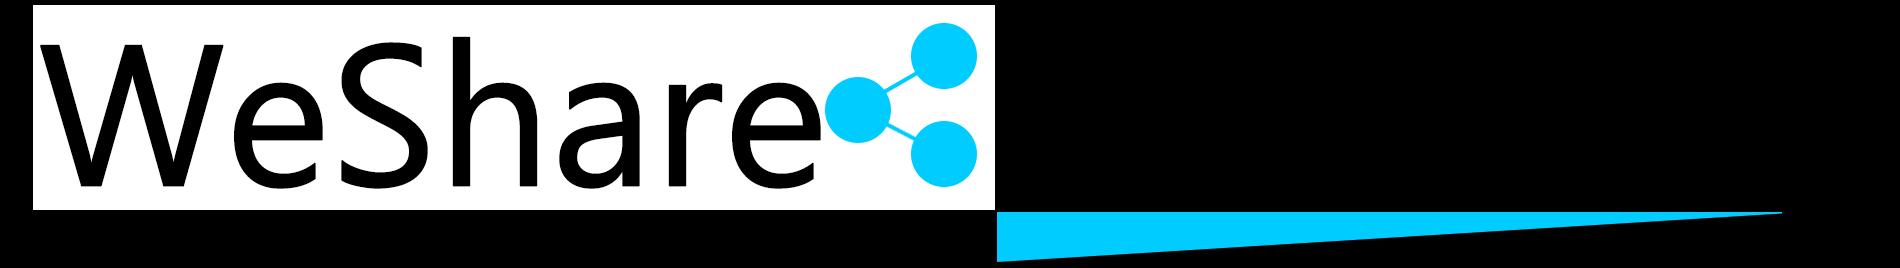 http://wesharemarketing.com/wp-content/uploads/2019/08/cropped-WeShare-logo-v1.png